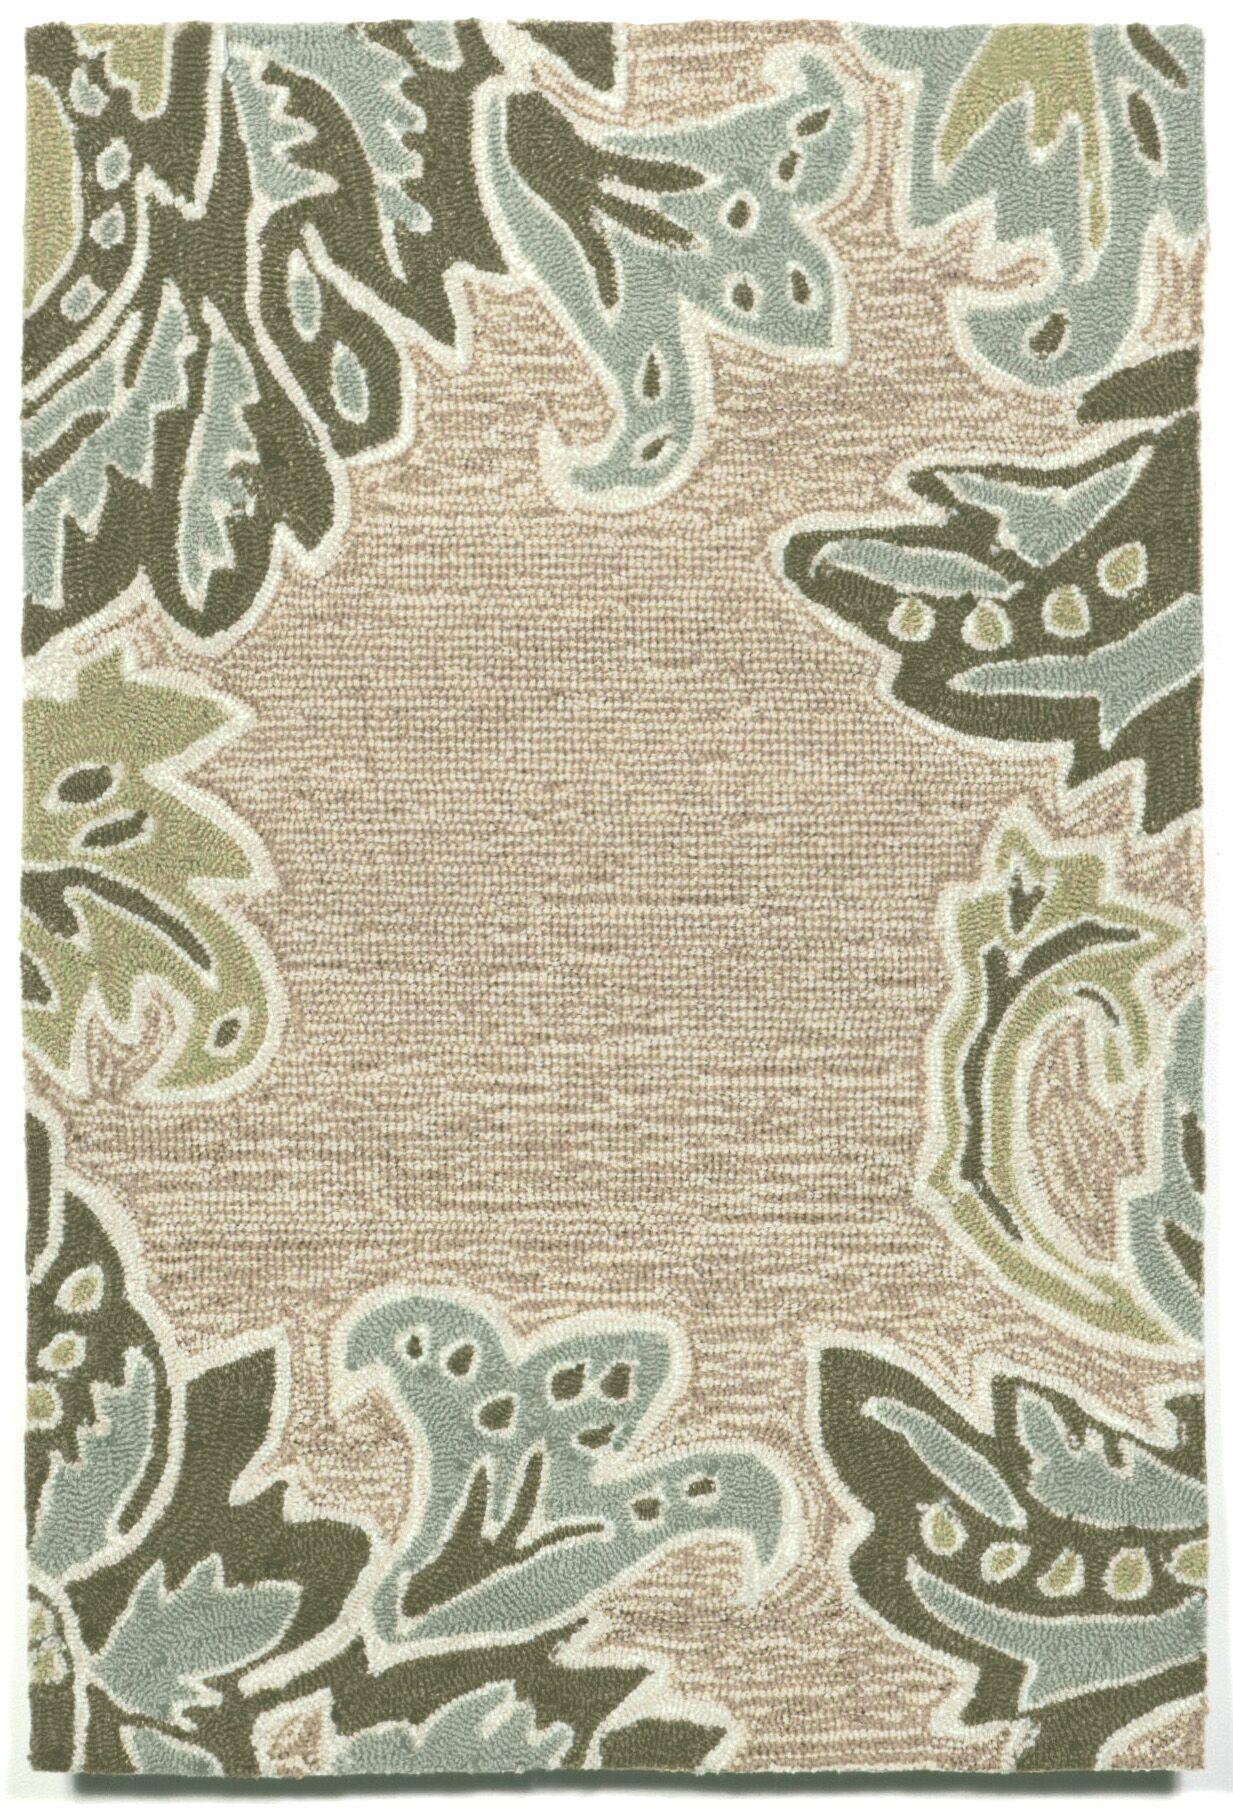 Cosmo Ornametal Leaf Border Aqua Indoor/Outdoor Rug Rug Size: Rectangle 5' x 7'6